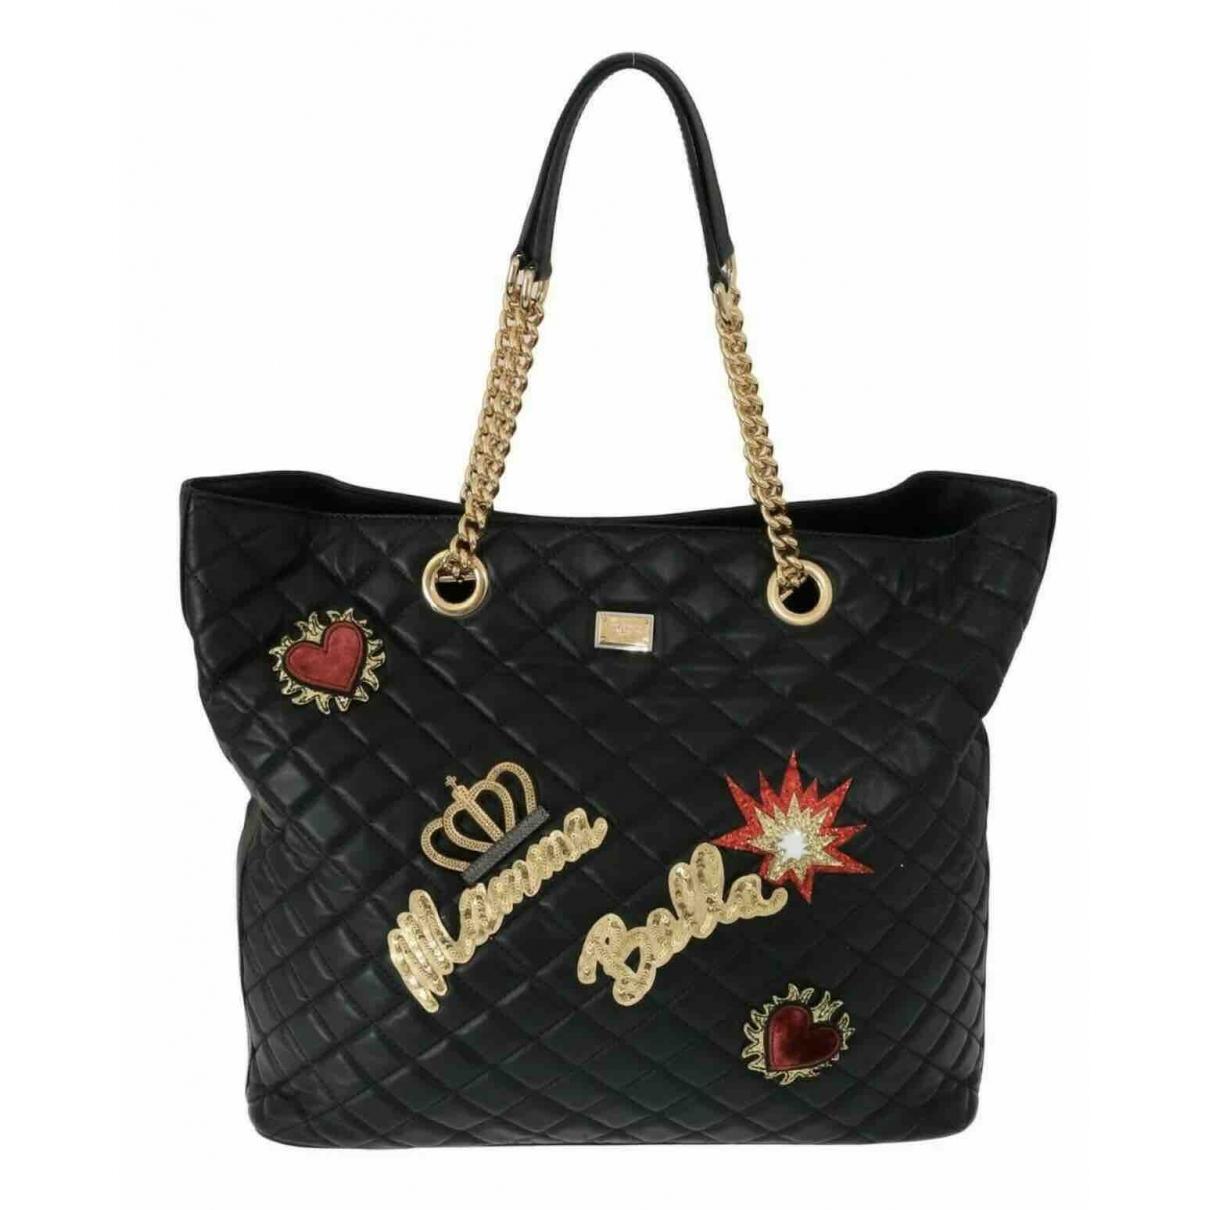 Dolce & Gabbana \N Black Leather handbag for Women \N